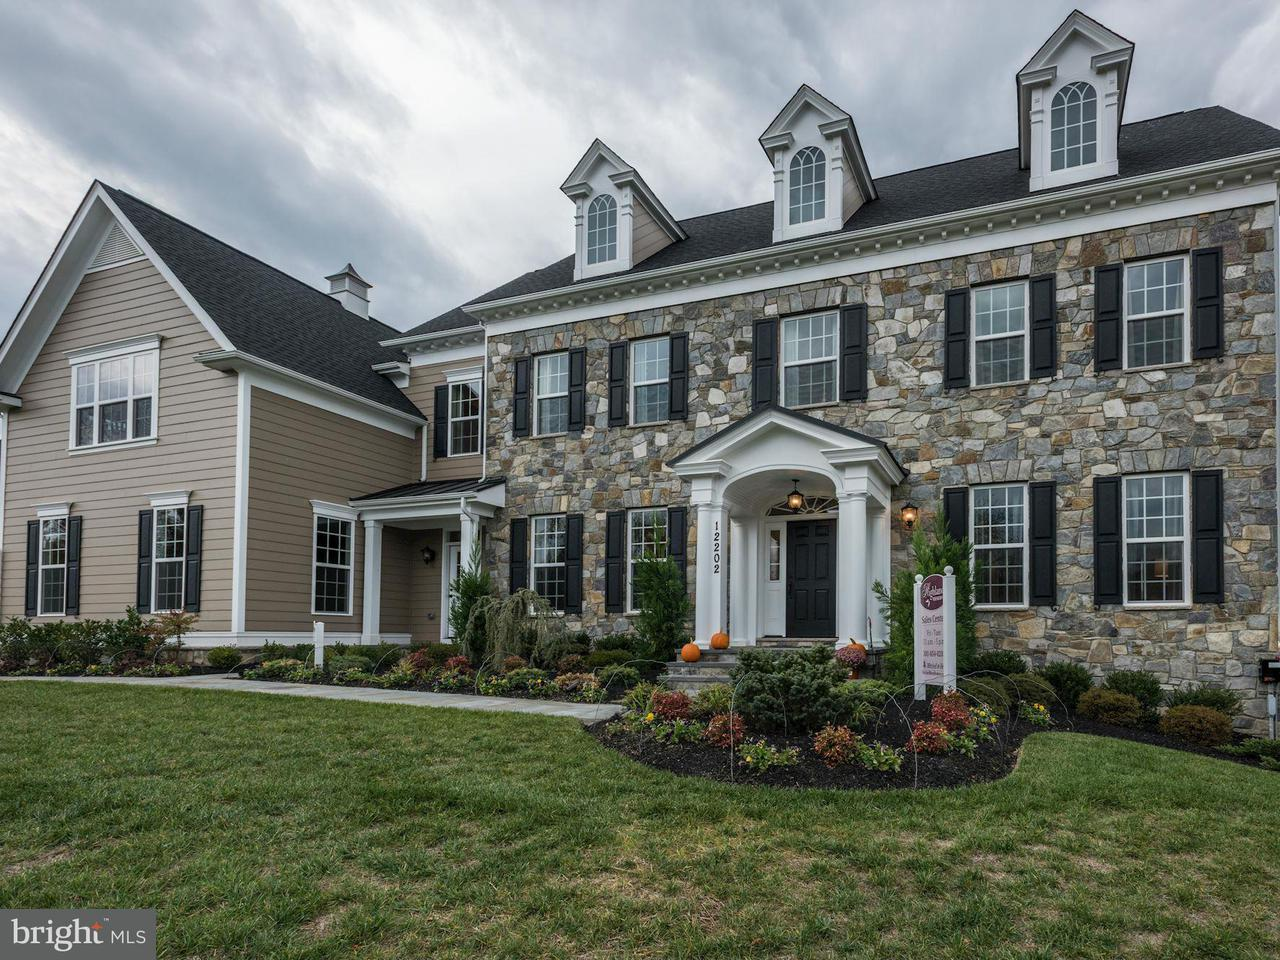 Vivienda unifamiliar por un Venta en 12337 Point Ridge Drive 12337 Point Ridge Drive Fulton, Maryland 20759 Estados Unidos